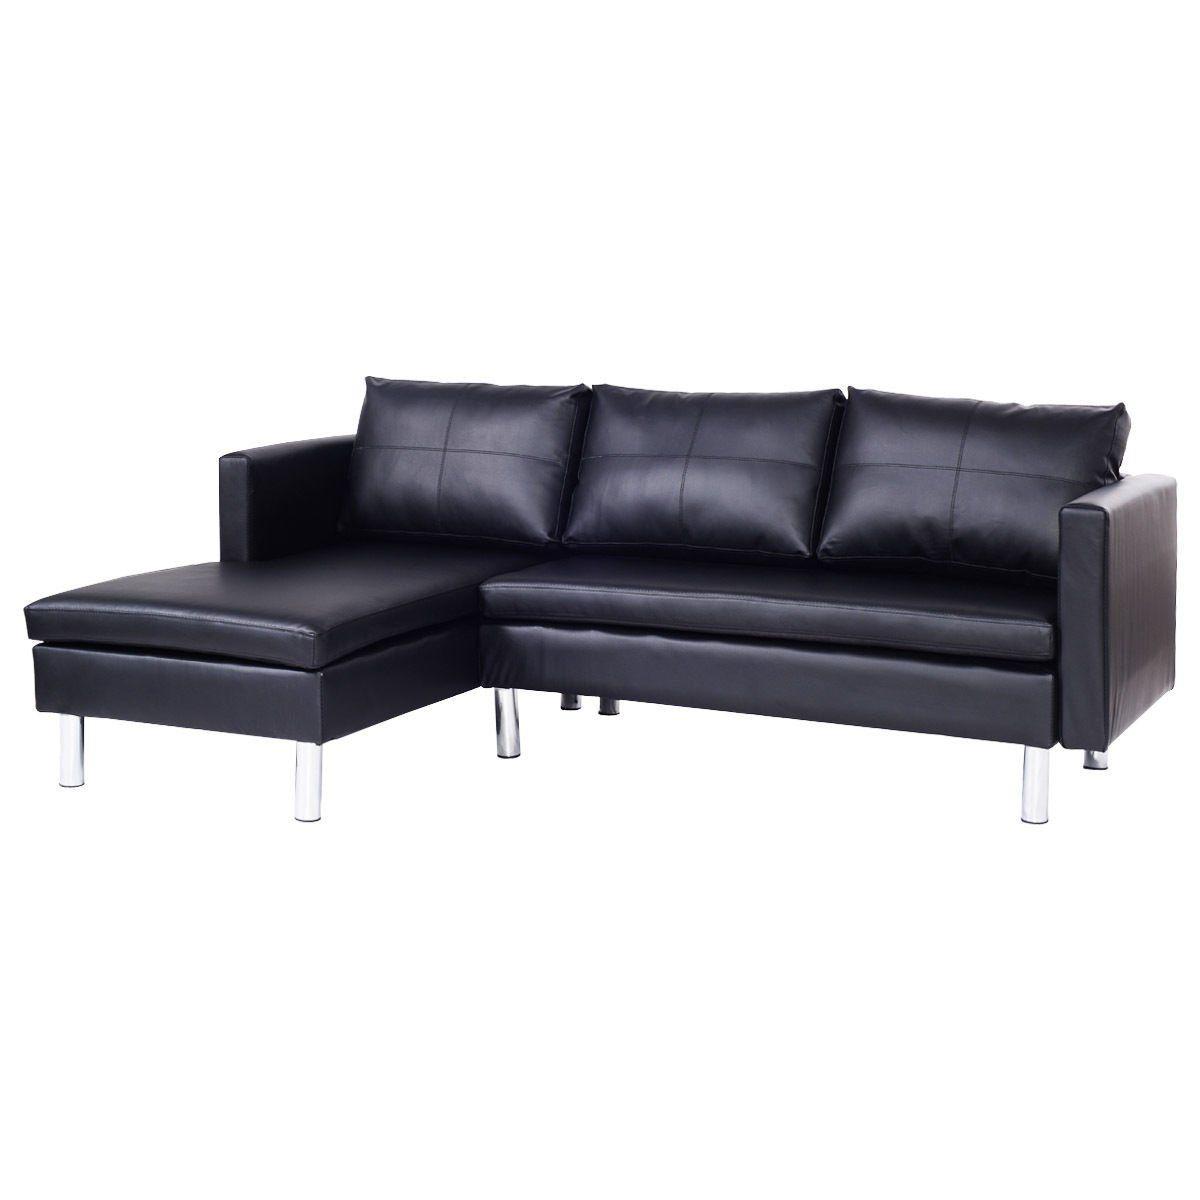 Ghp Black Pvc Leather Padded Cushion